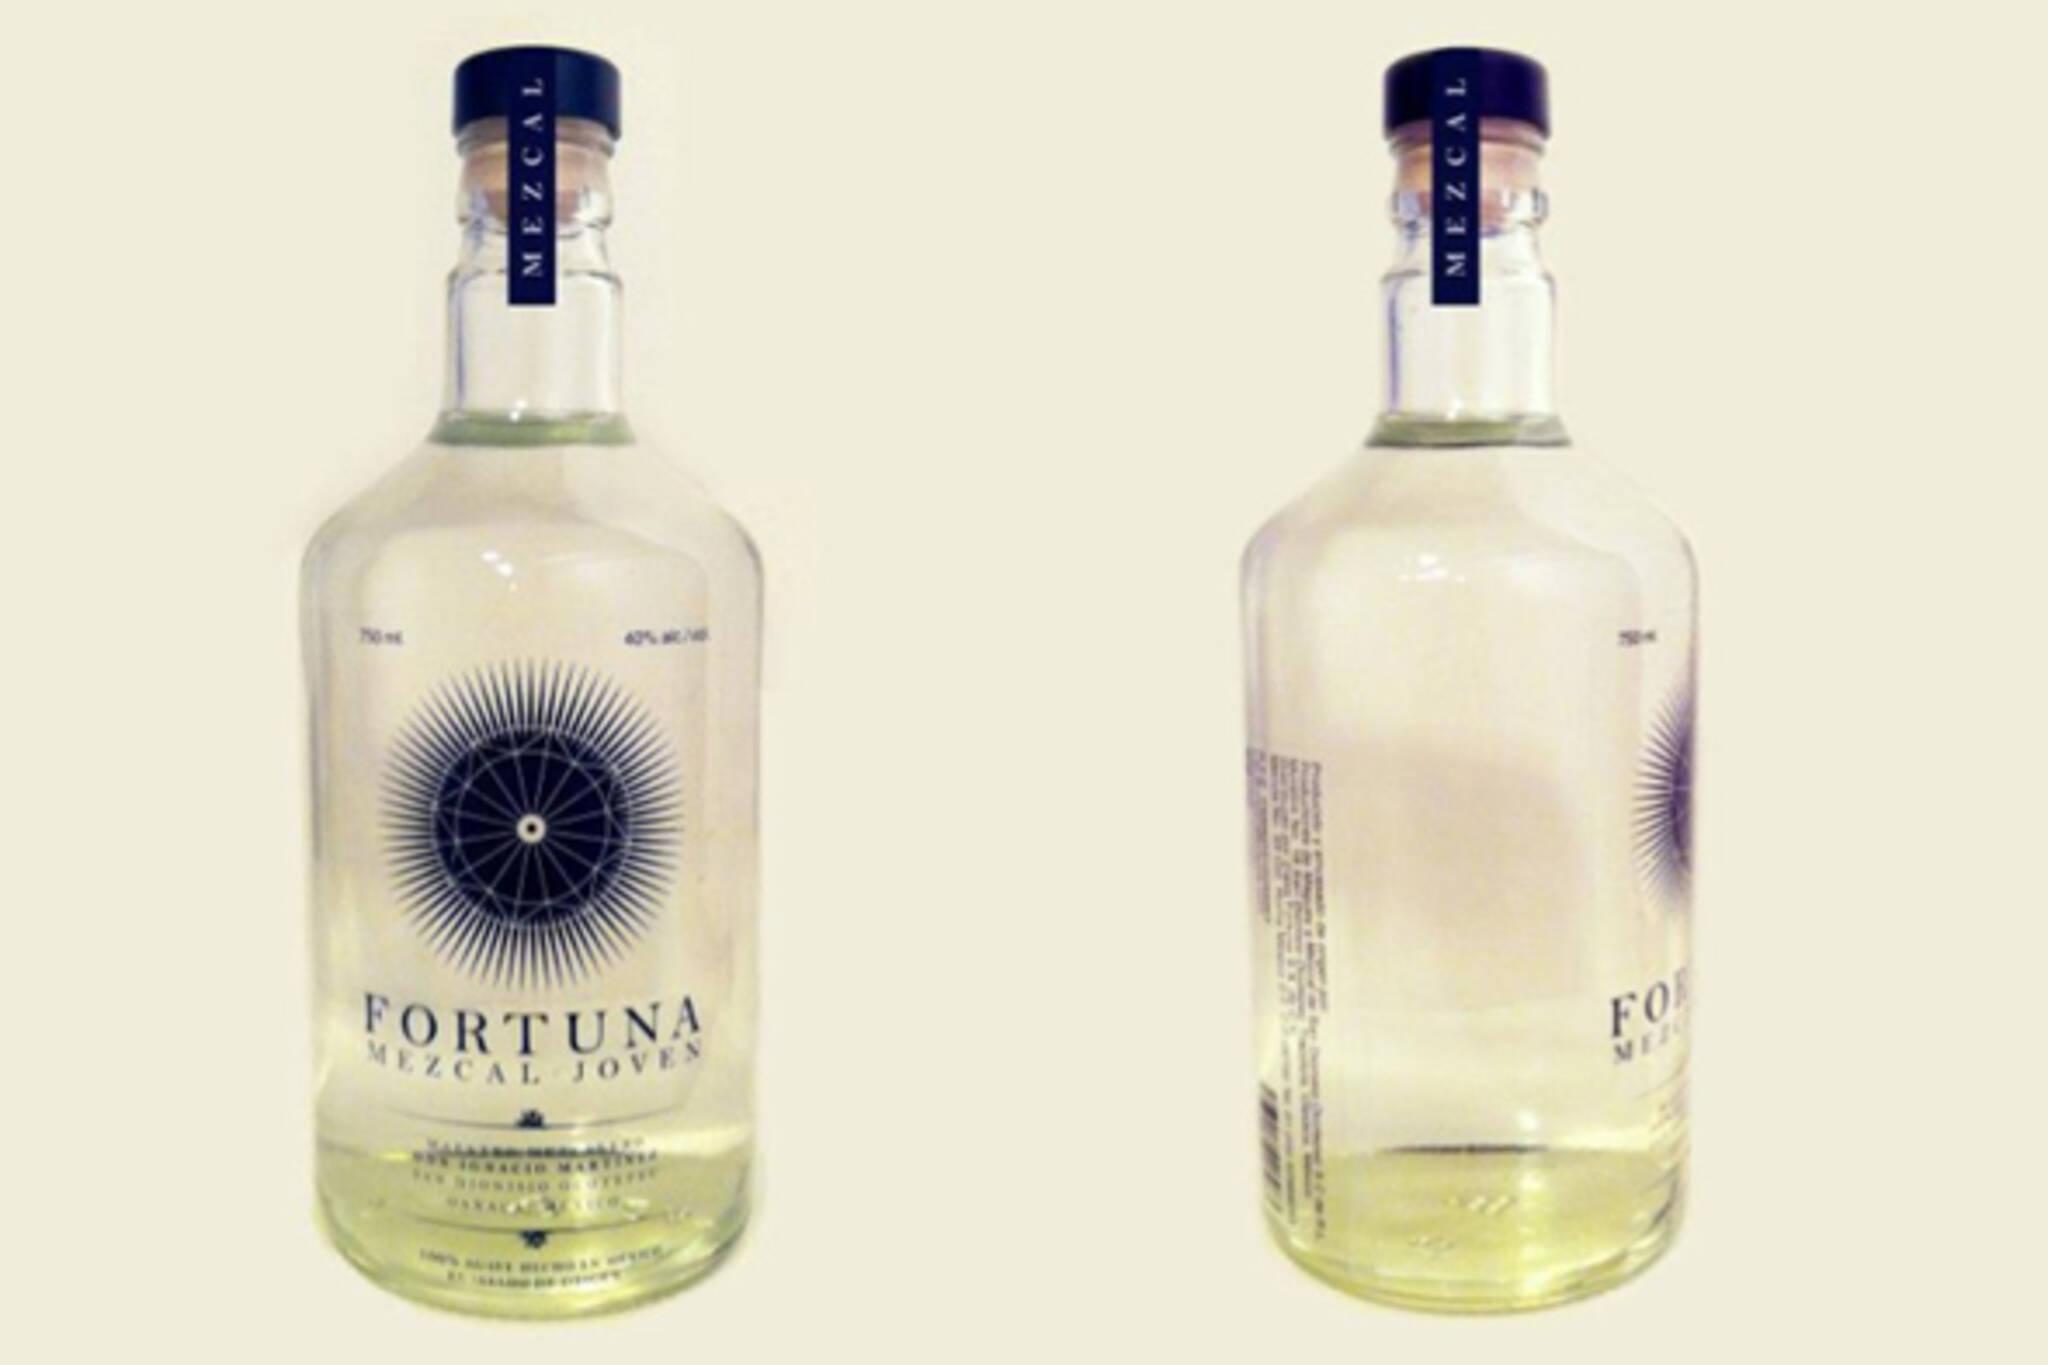 Fortuna Mezcal